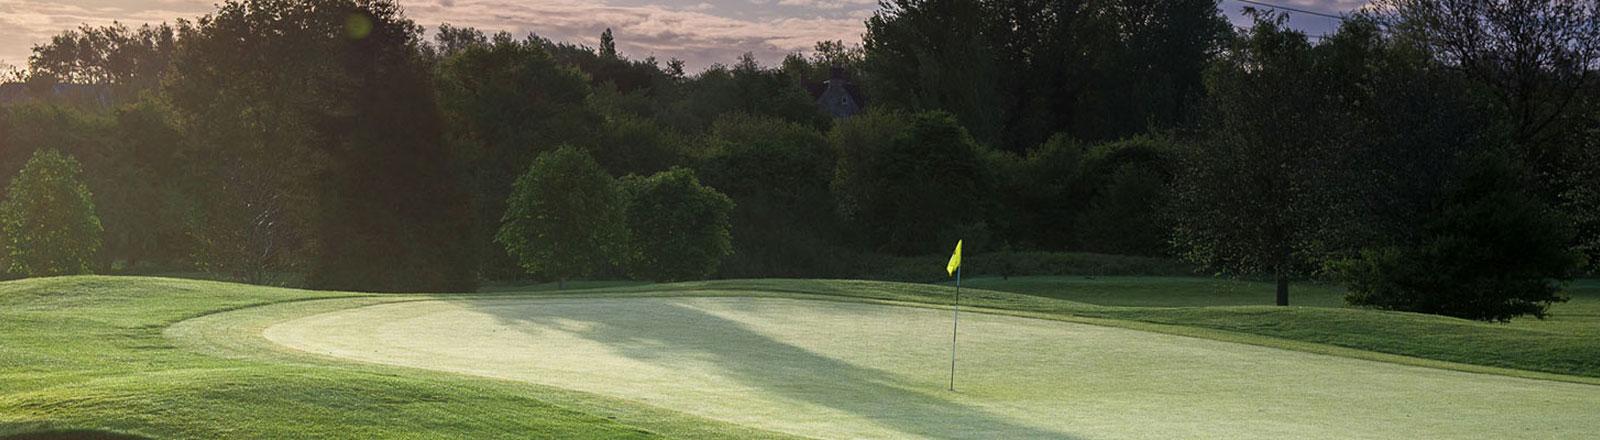 Thornbury golf course, green in low sun